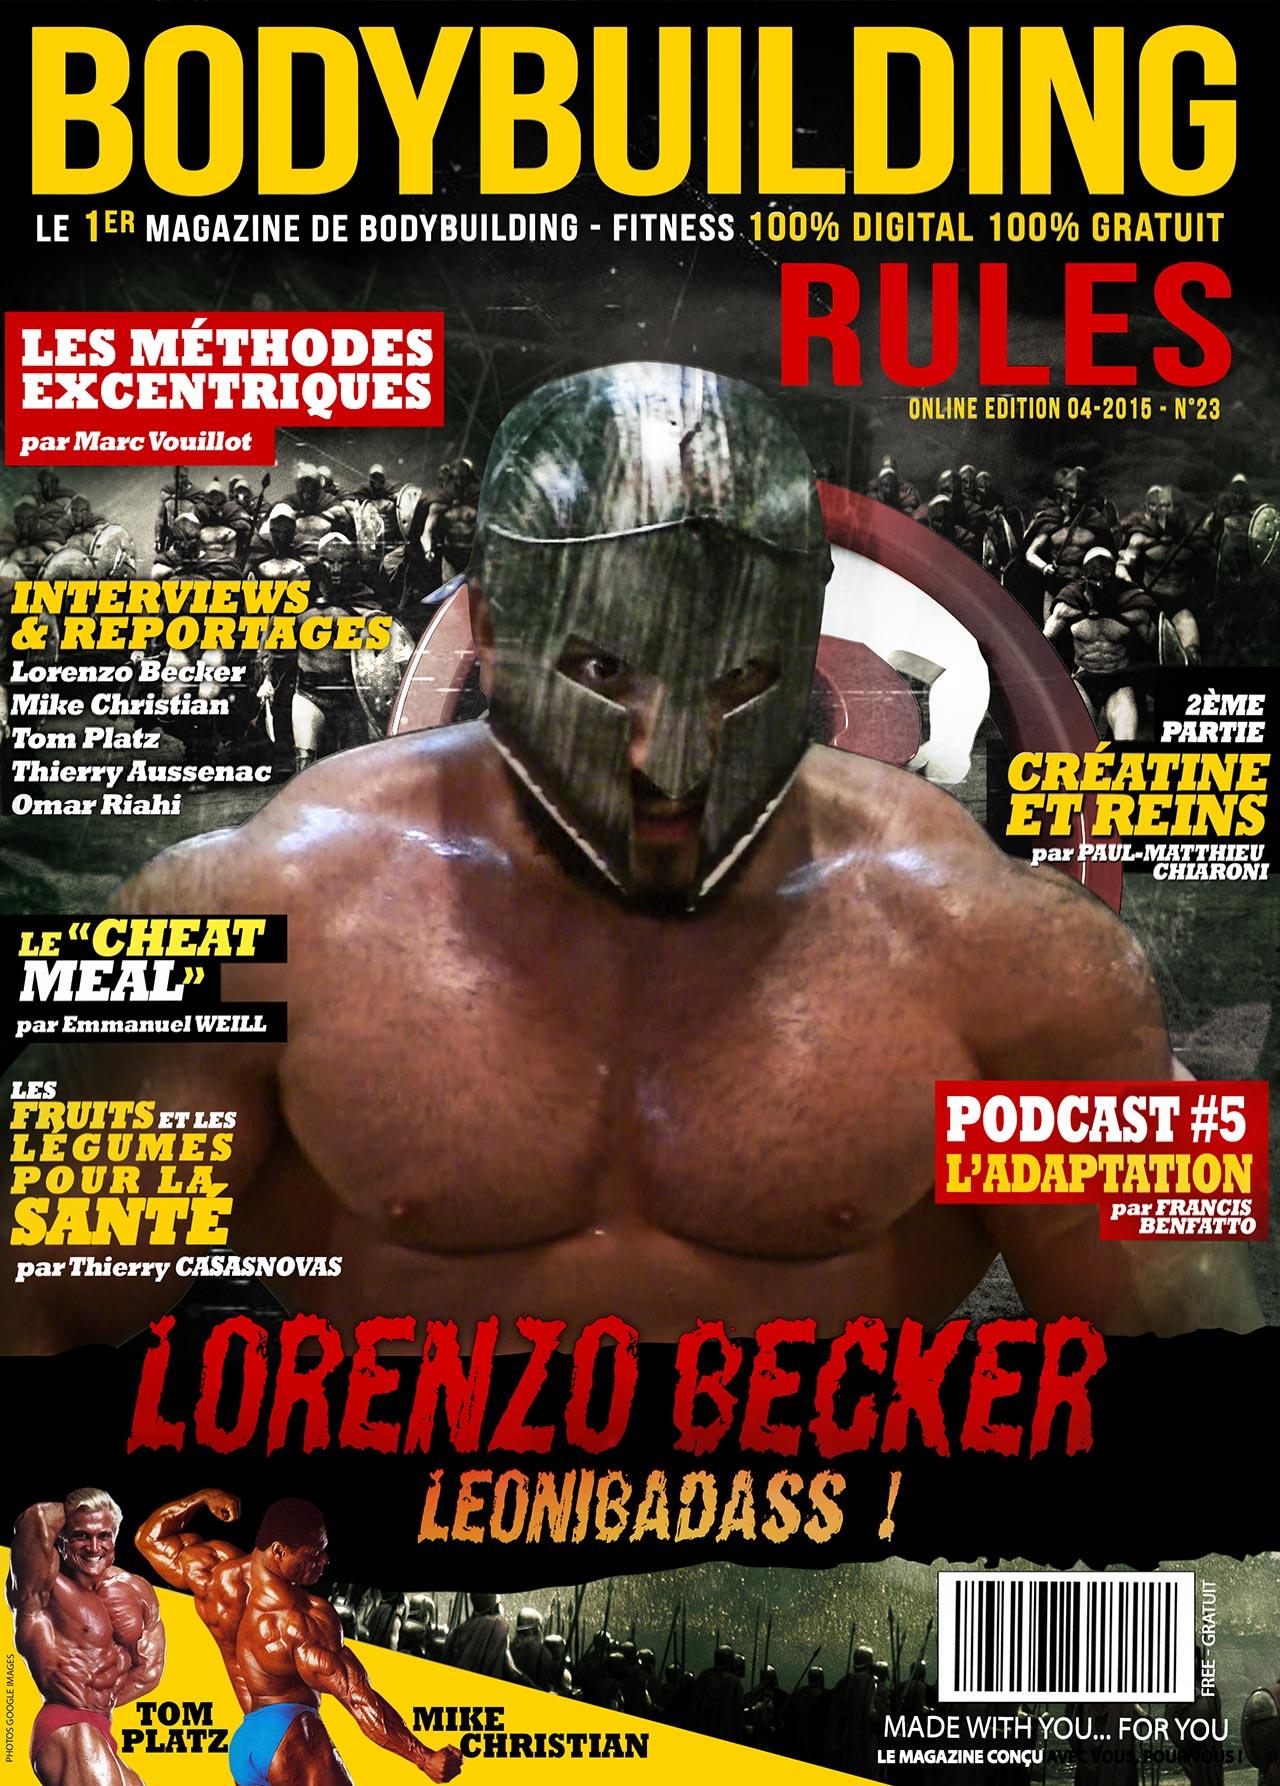 magazine - www.bodybuilding-rules.com le magazine interactif GRATUIT  1bbrM23